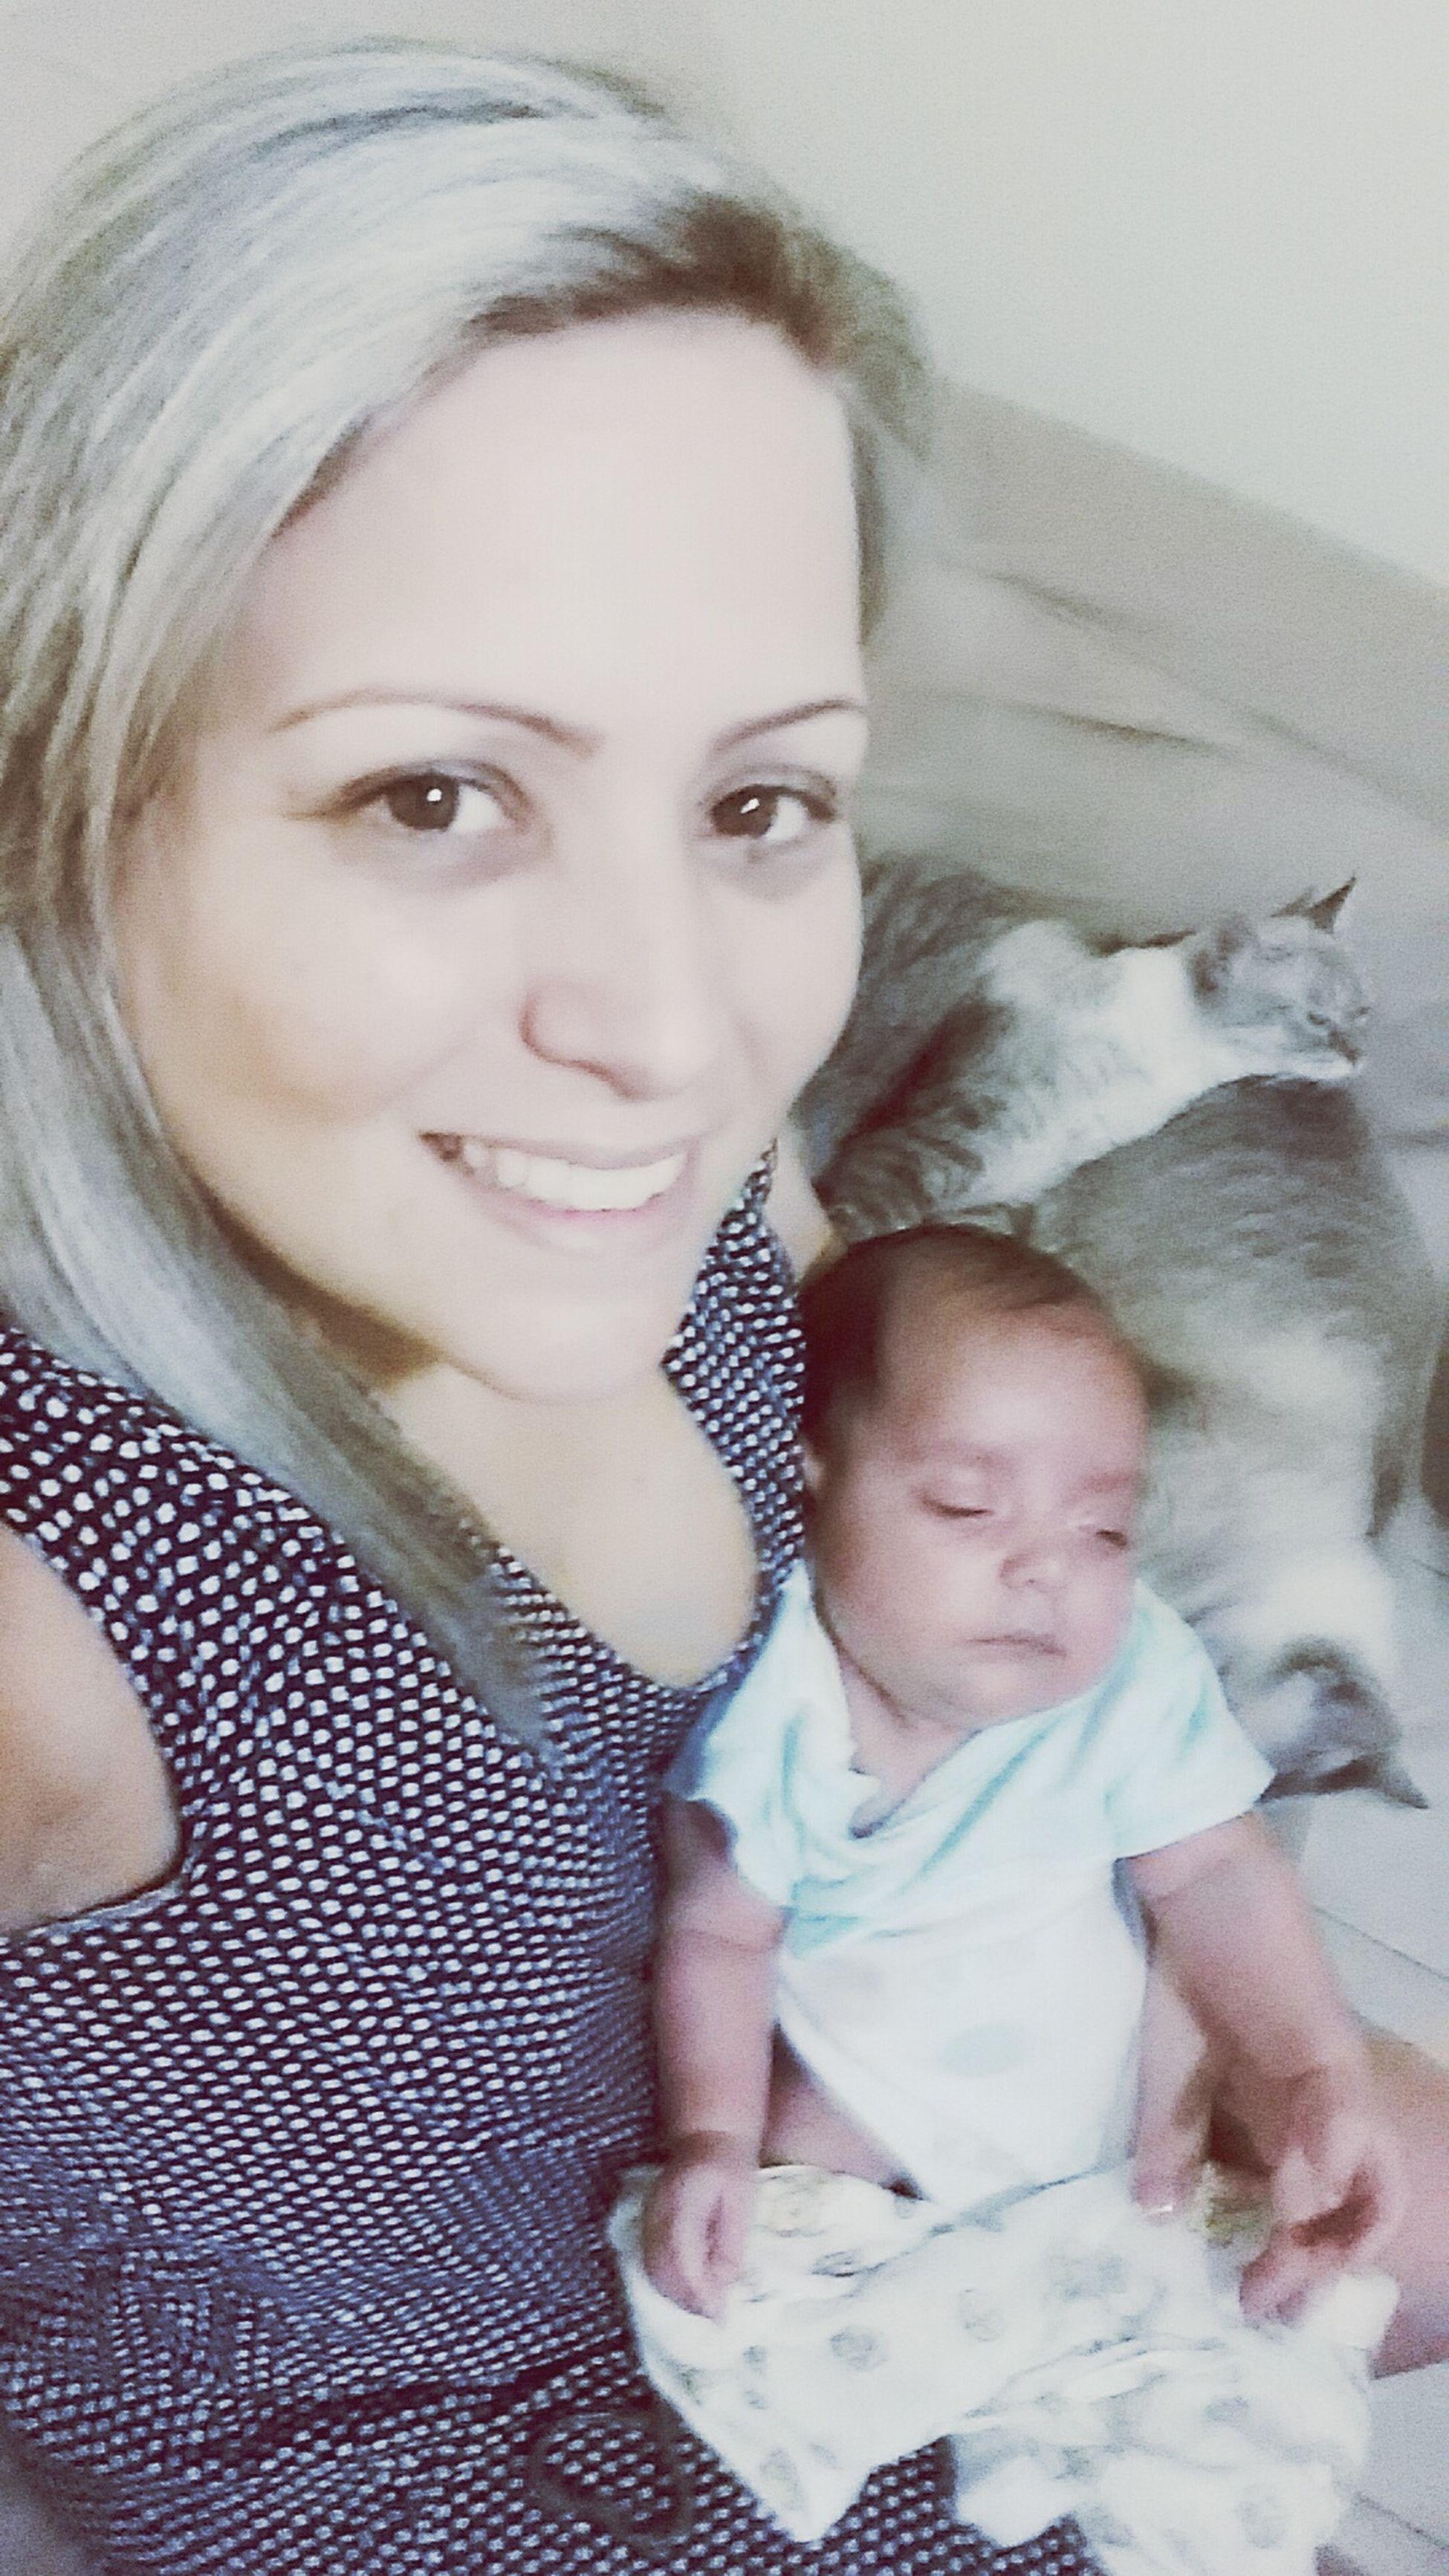 Muito amor Babyboy💘 Family With One Child Baby Love Newborn Maedemenino Maedeumprincipe